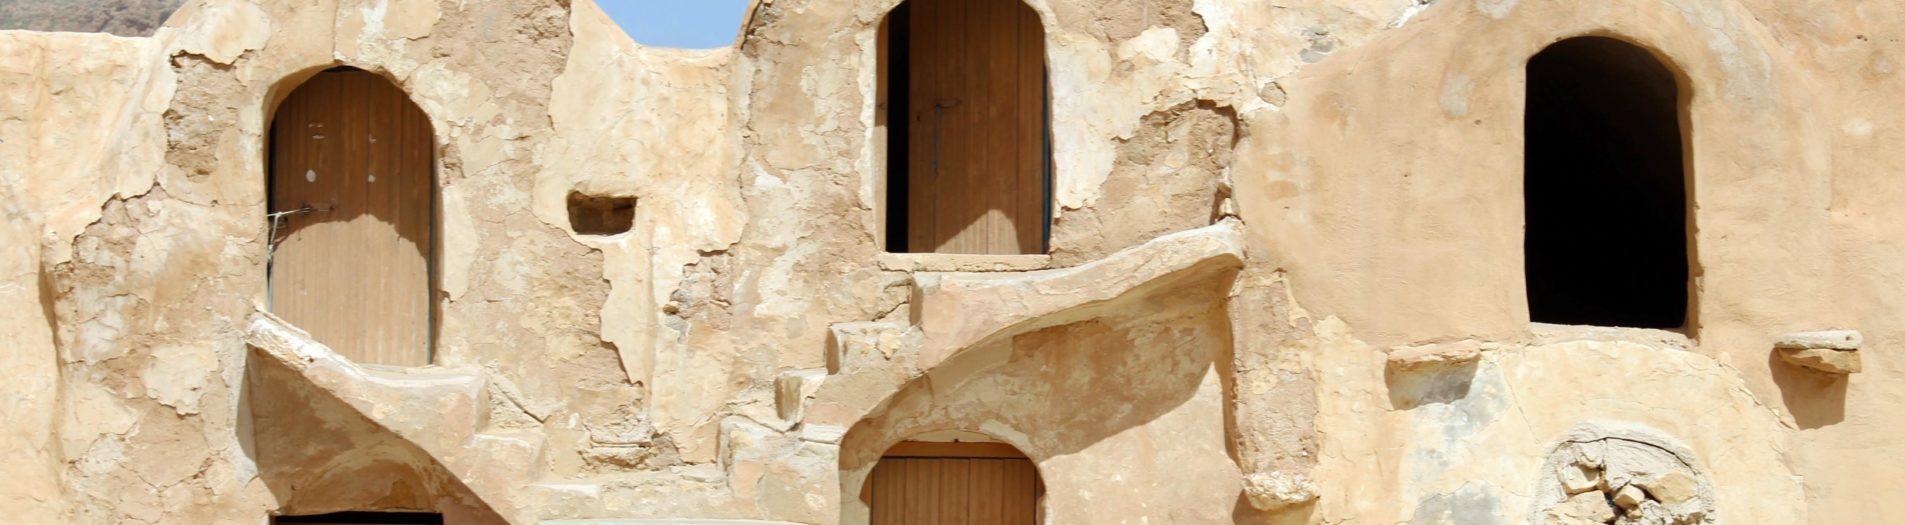 Ksar Hallouf قصر الحلوف